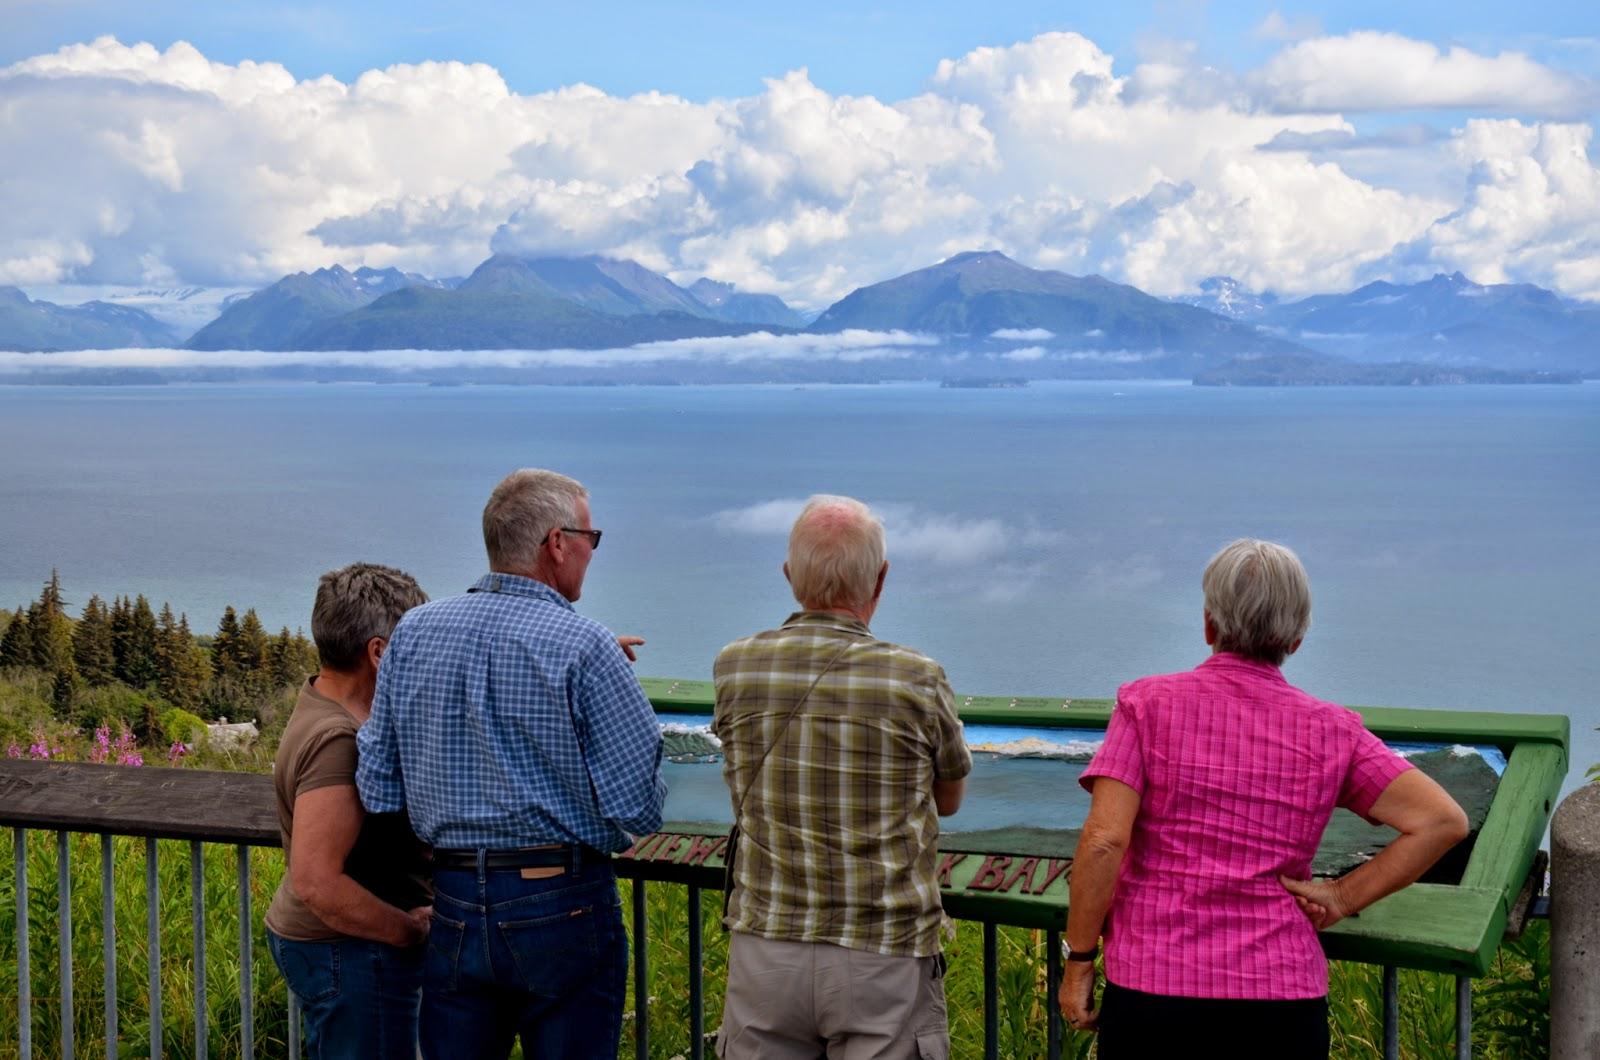 Close to Homer, overlooking Cook Inlet toward the Kenai Mountain